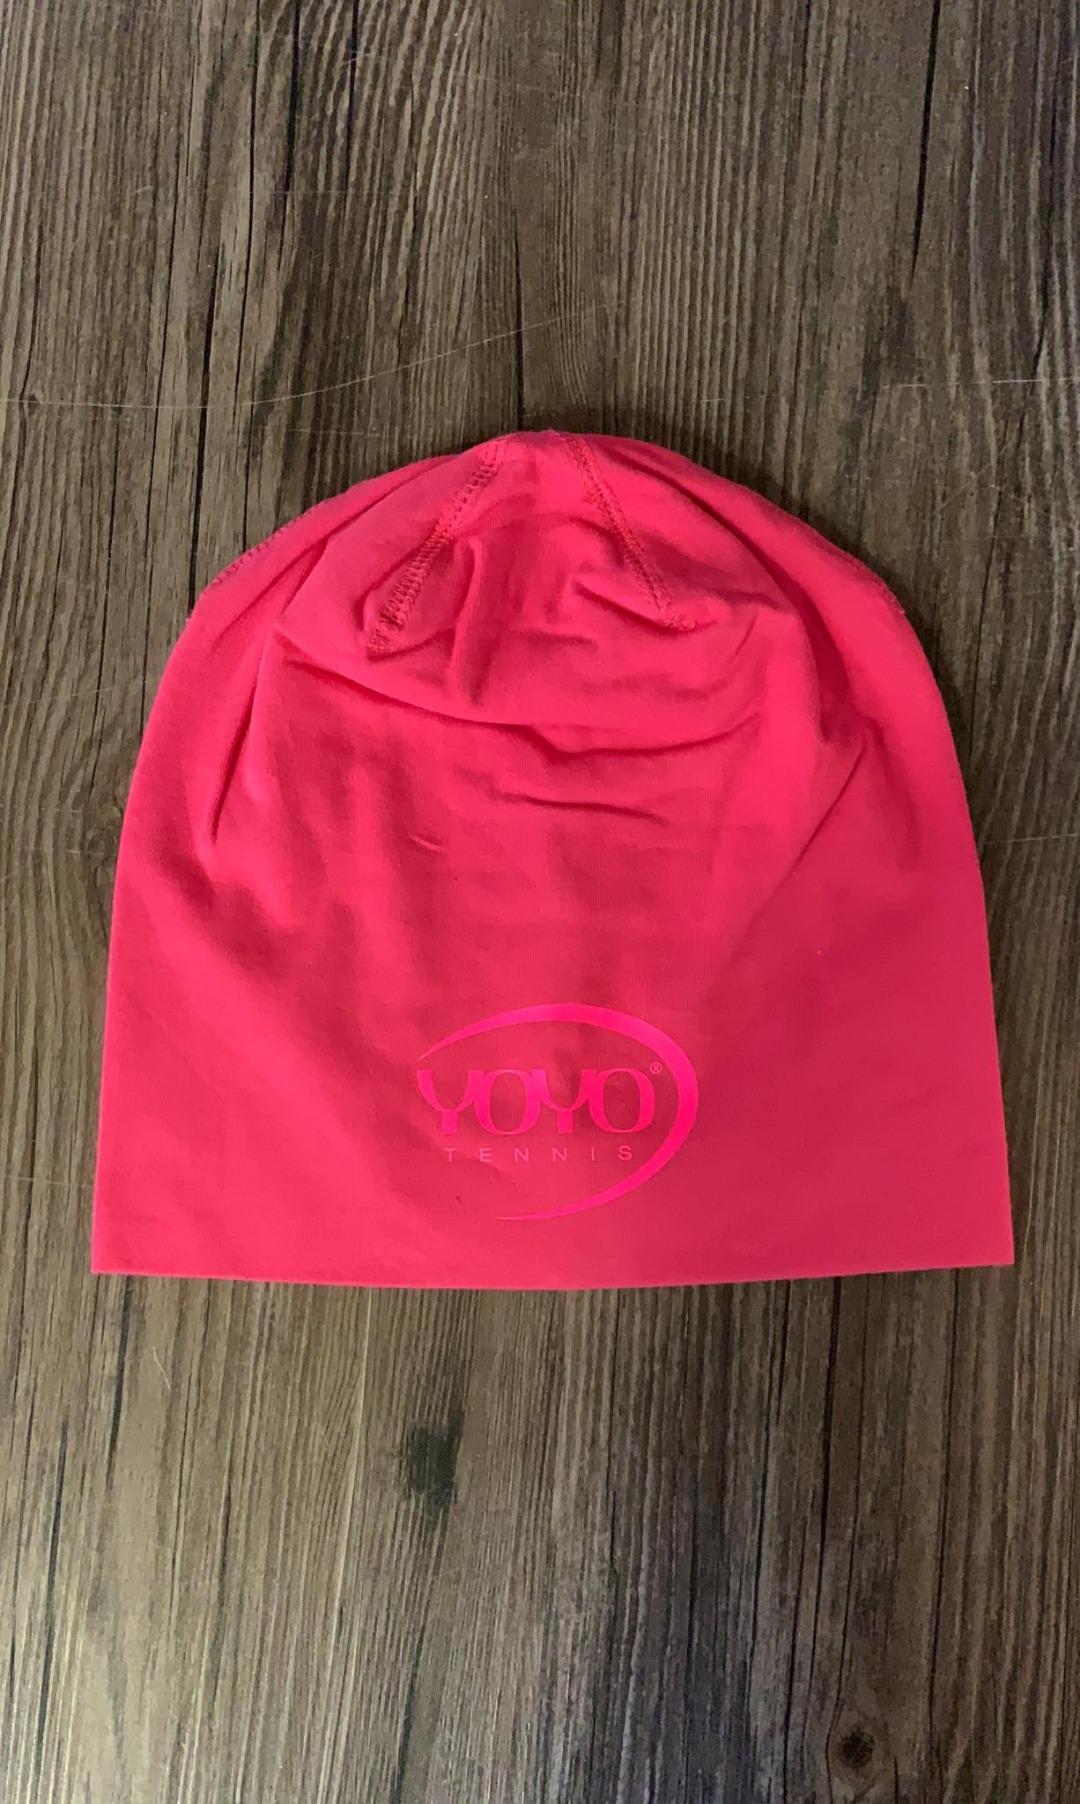 YOYO-TENNIS Cuffia Pink con Logo Rosa